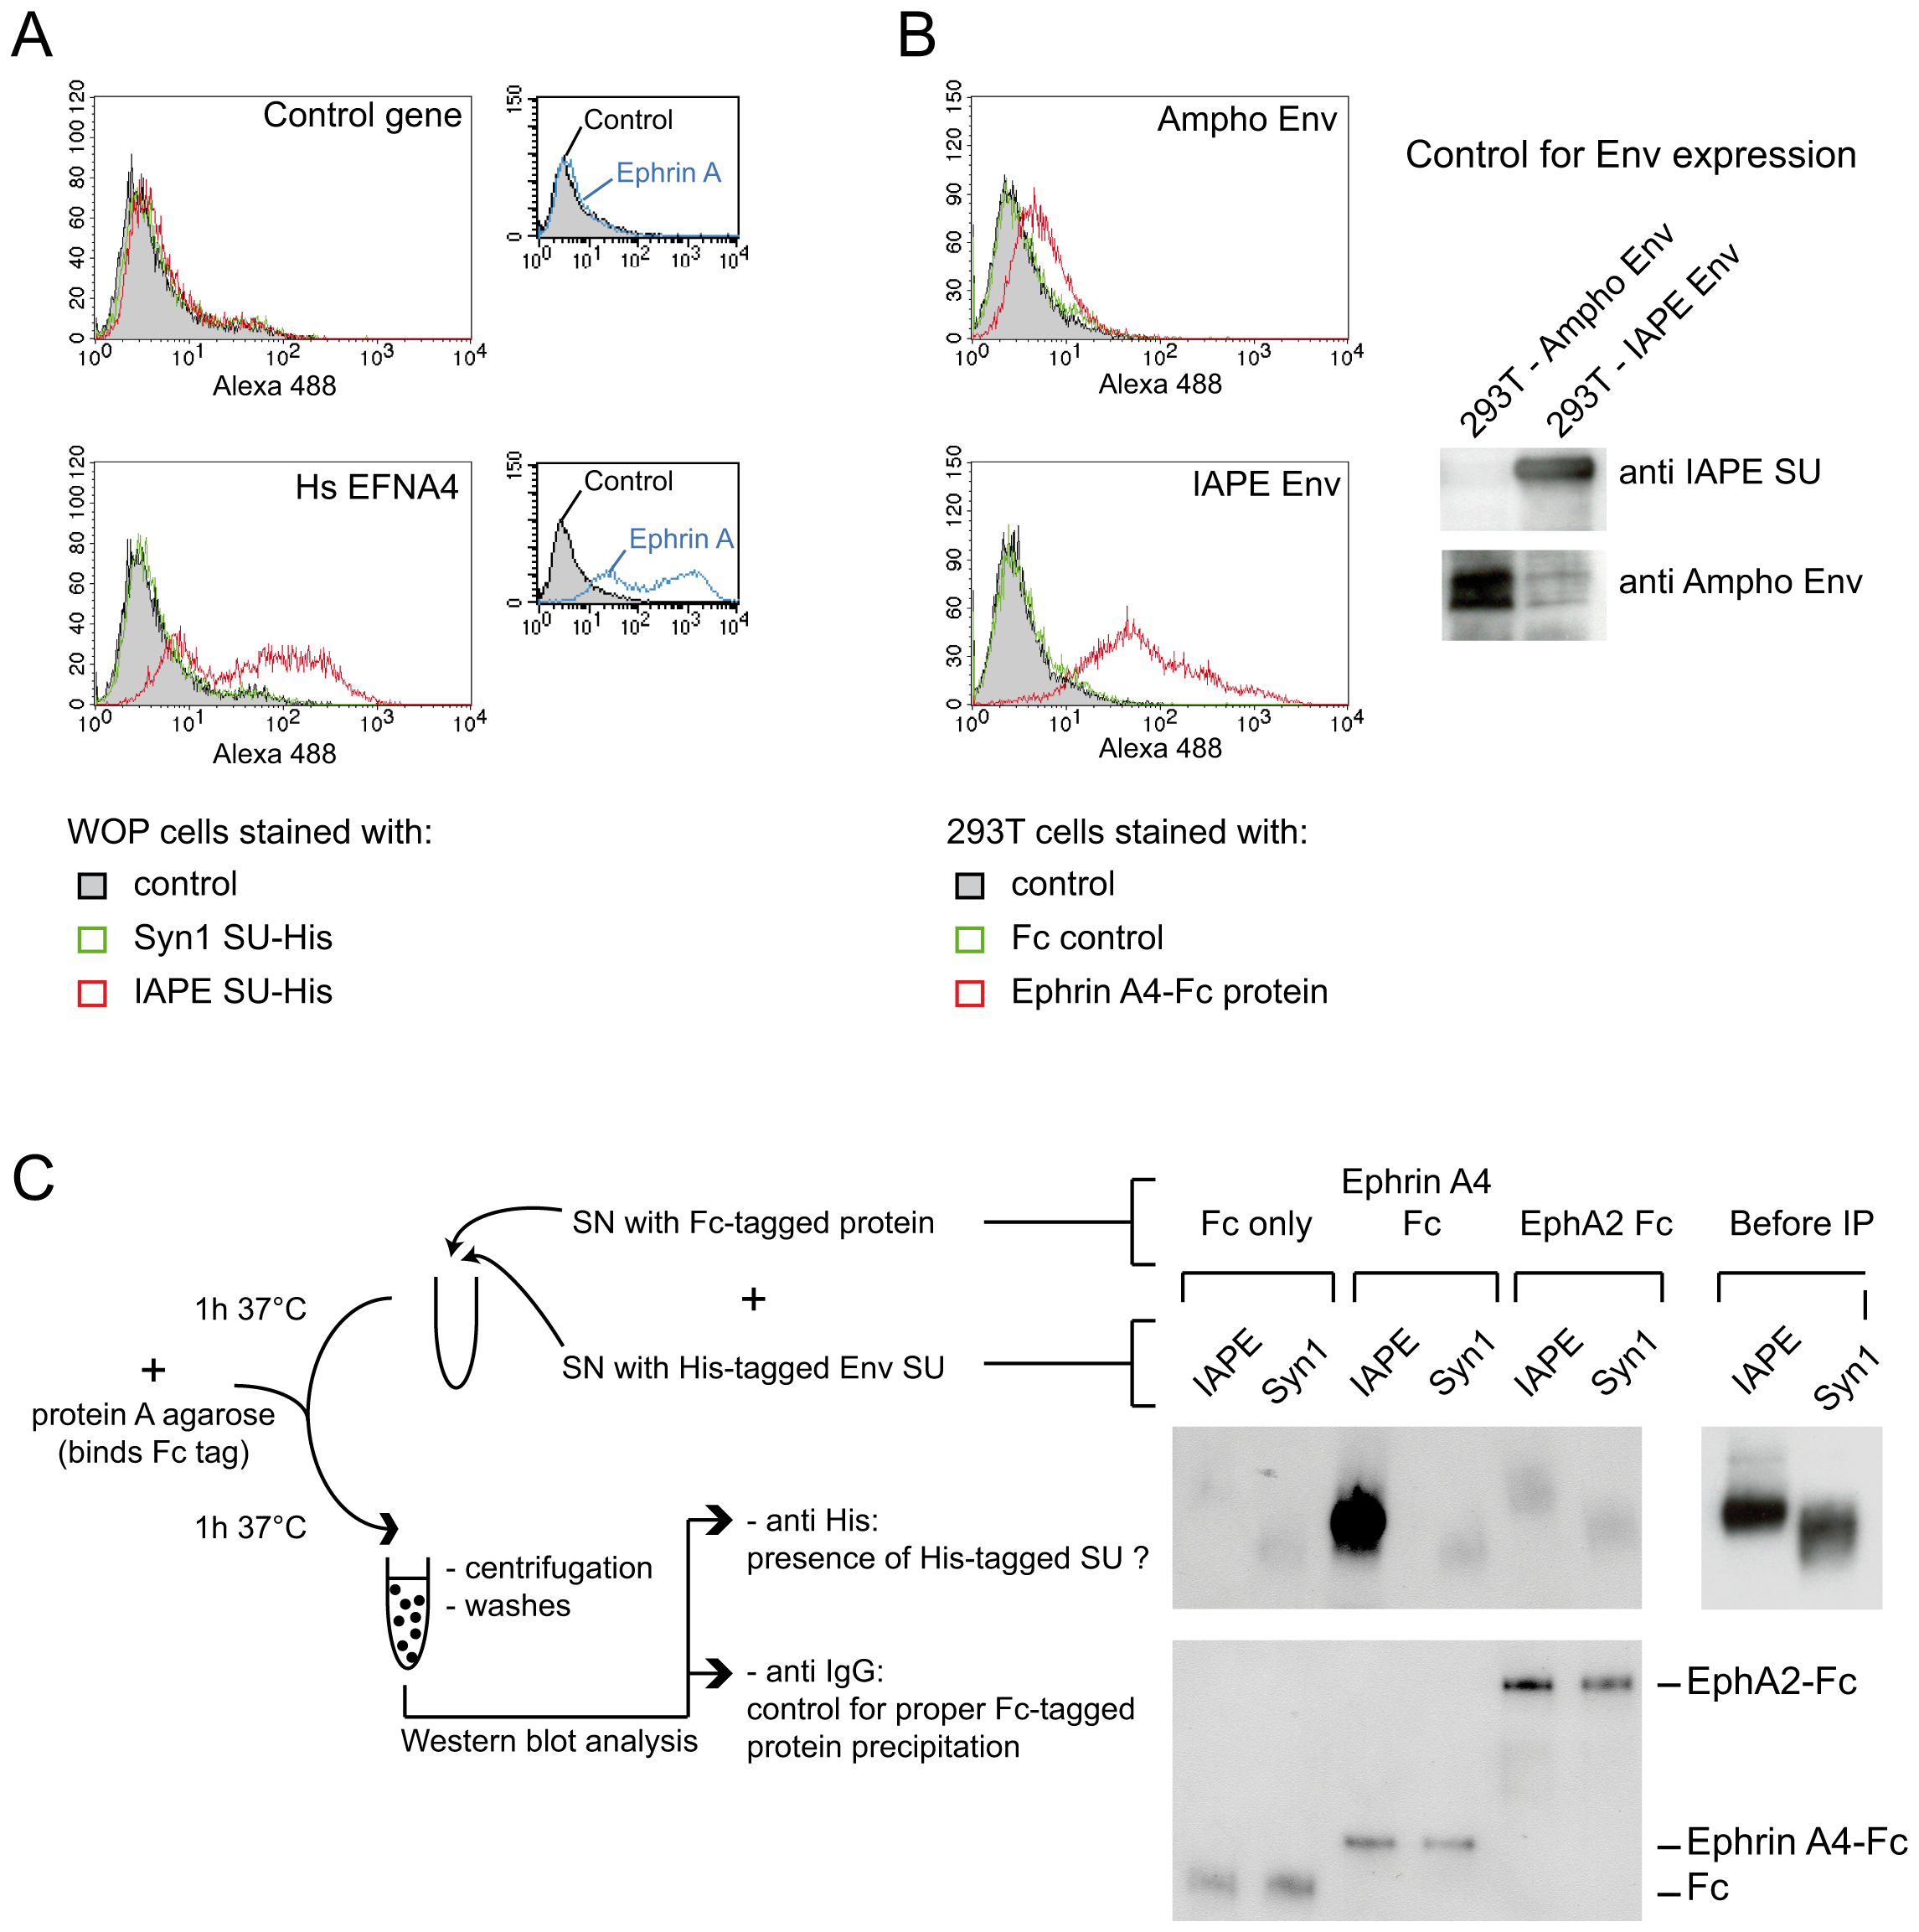 Ephrin A4 is a bona fide receptor for the IAPE Env.